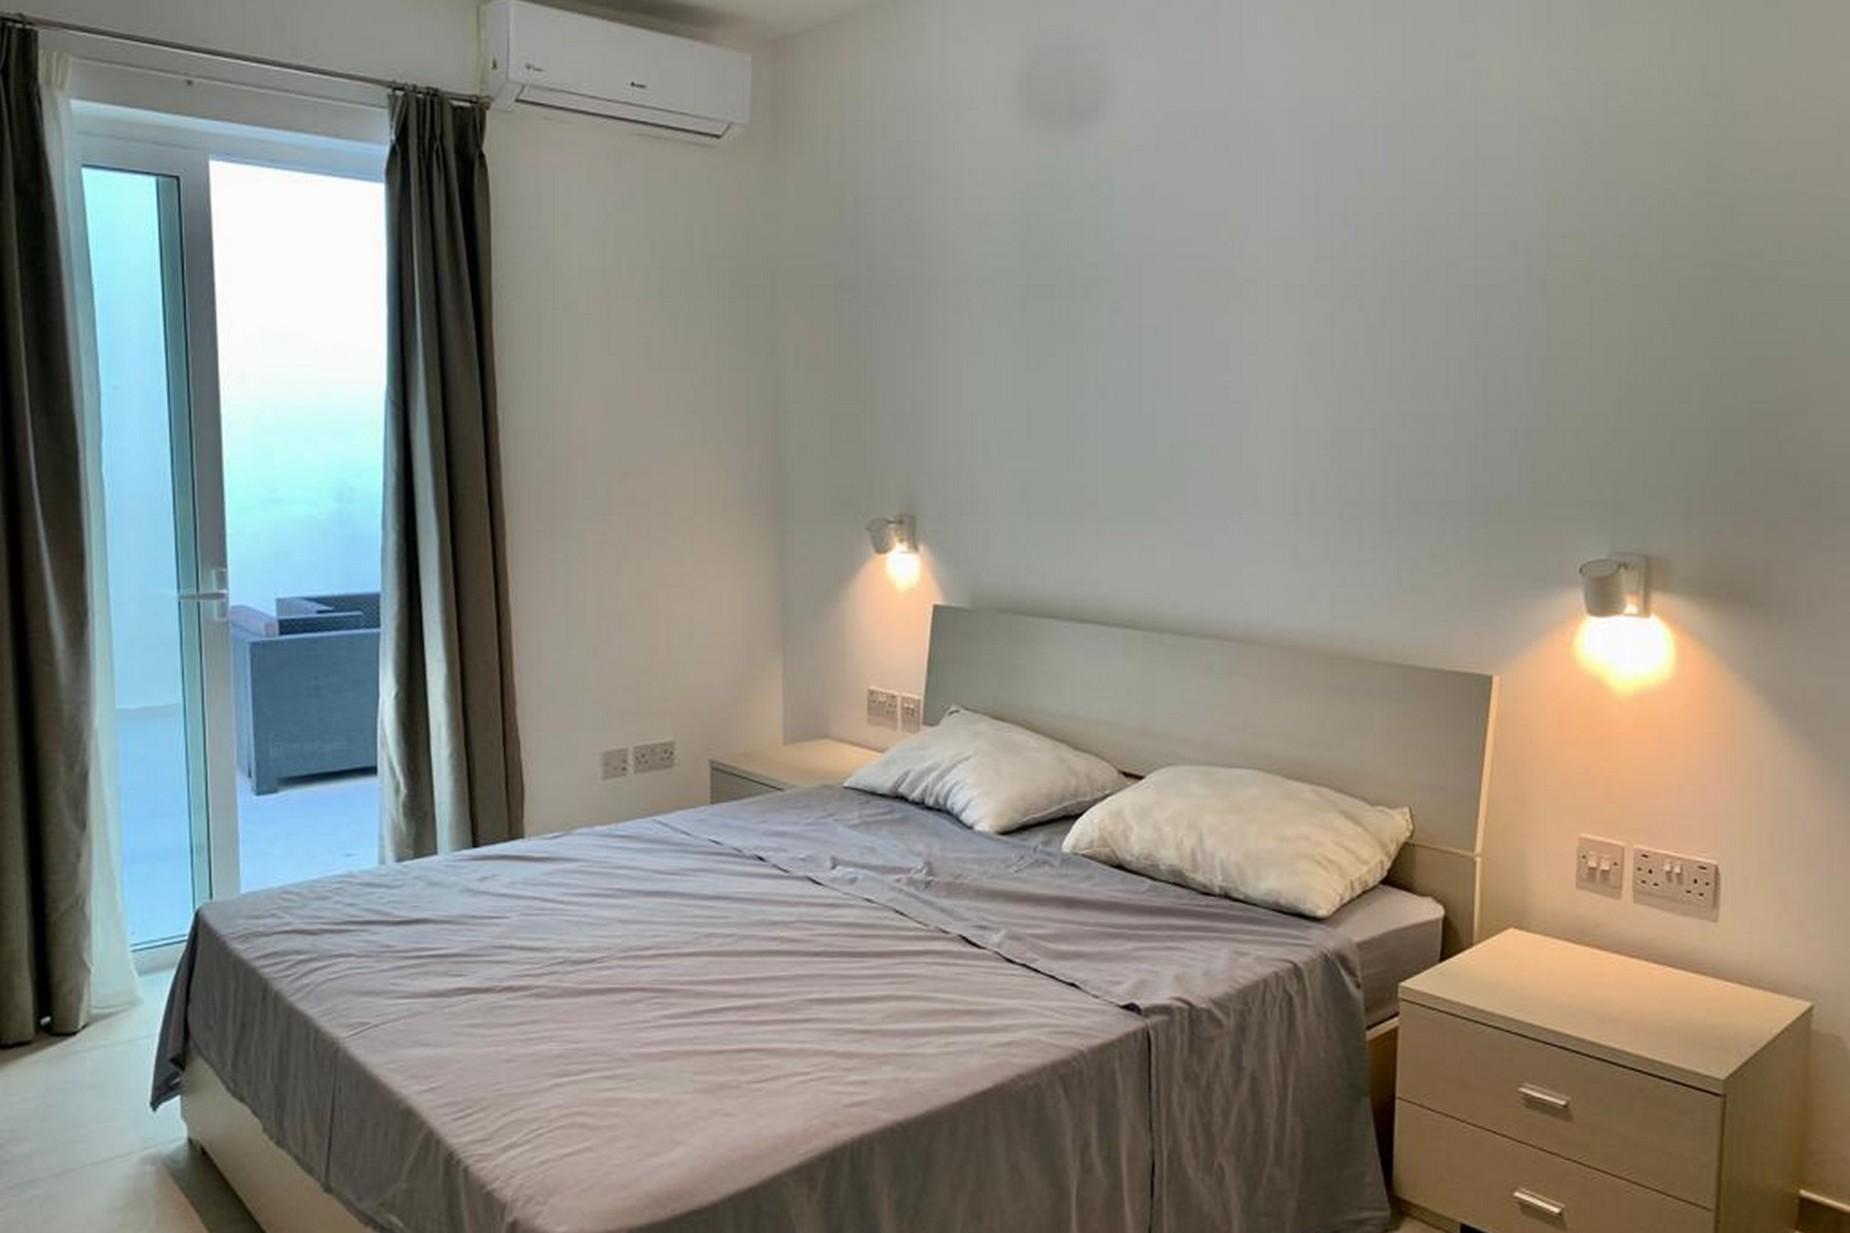 2 bed Maisonette For Rent in Swieqi, Swieqi - thumb 4